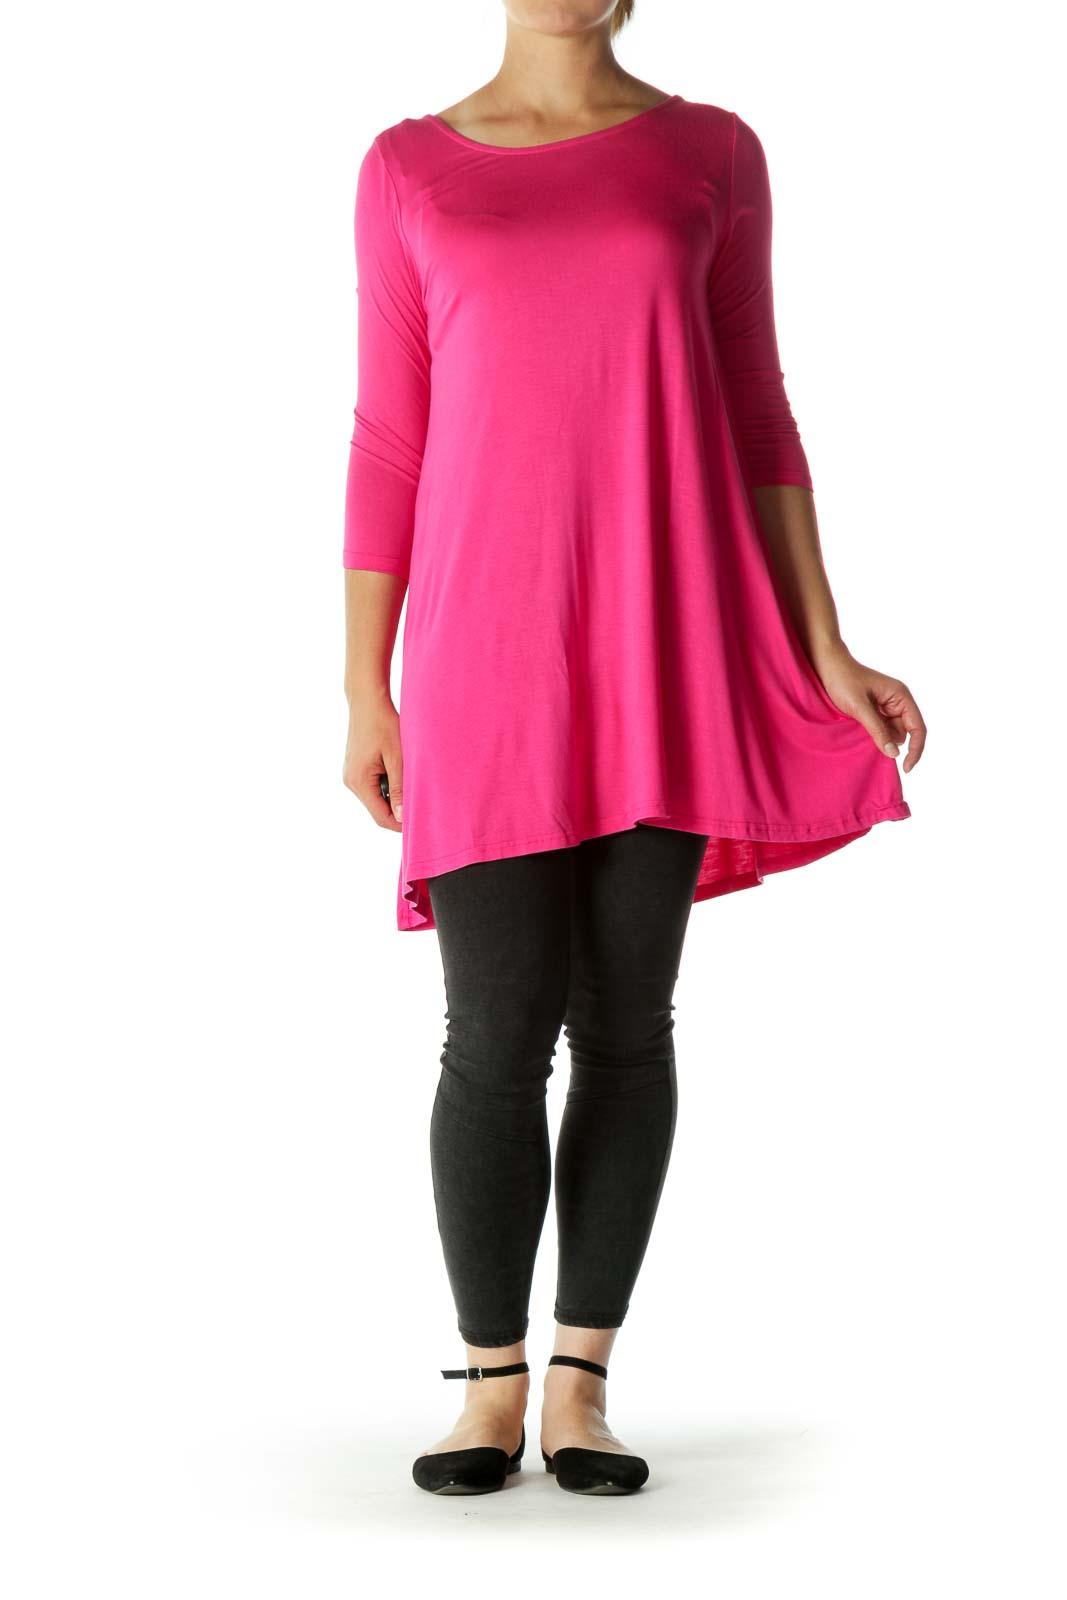 Pink Back Upper Detail 3/4 Sleeve Jersey Top